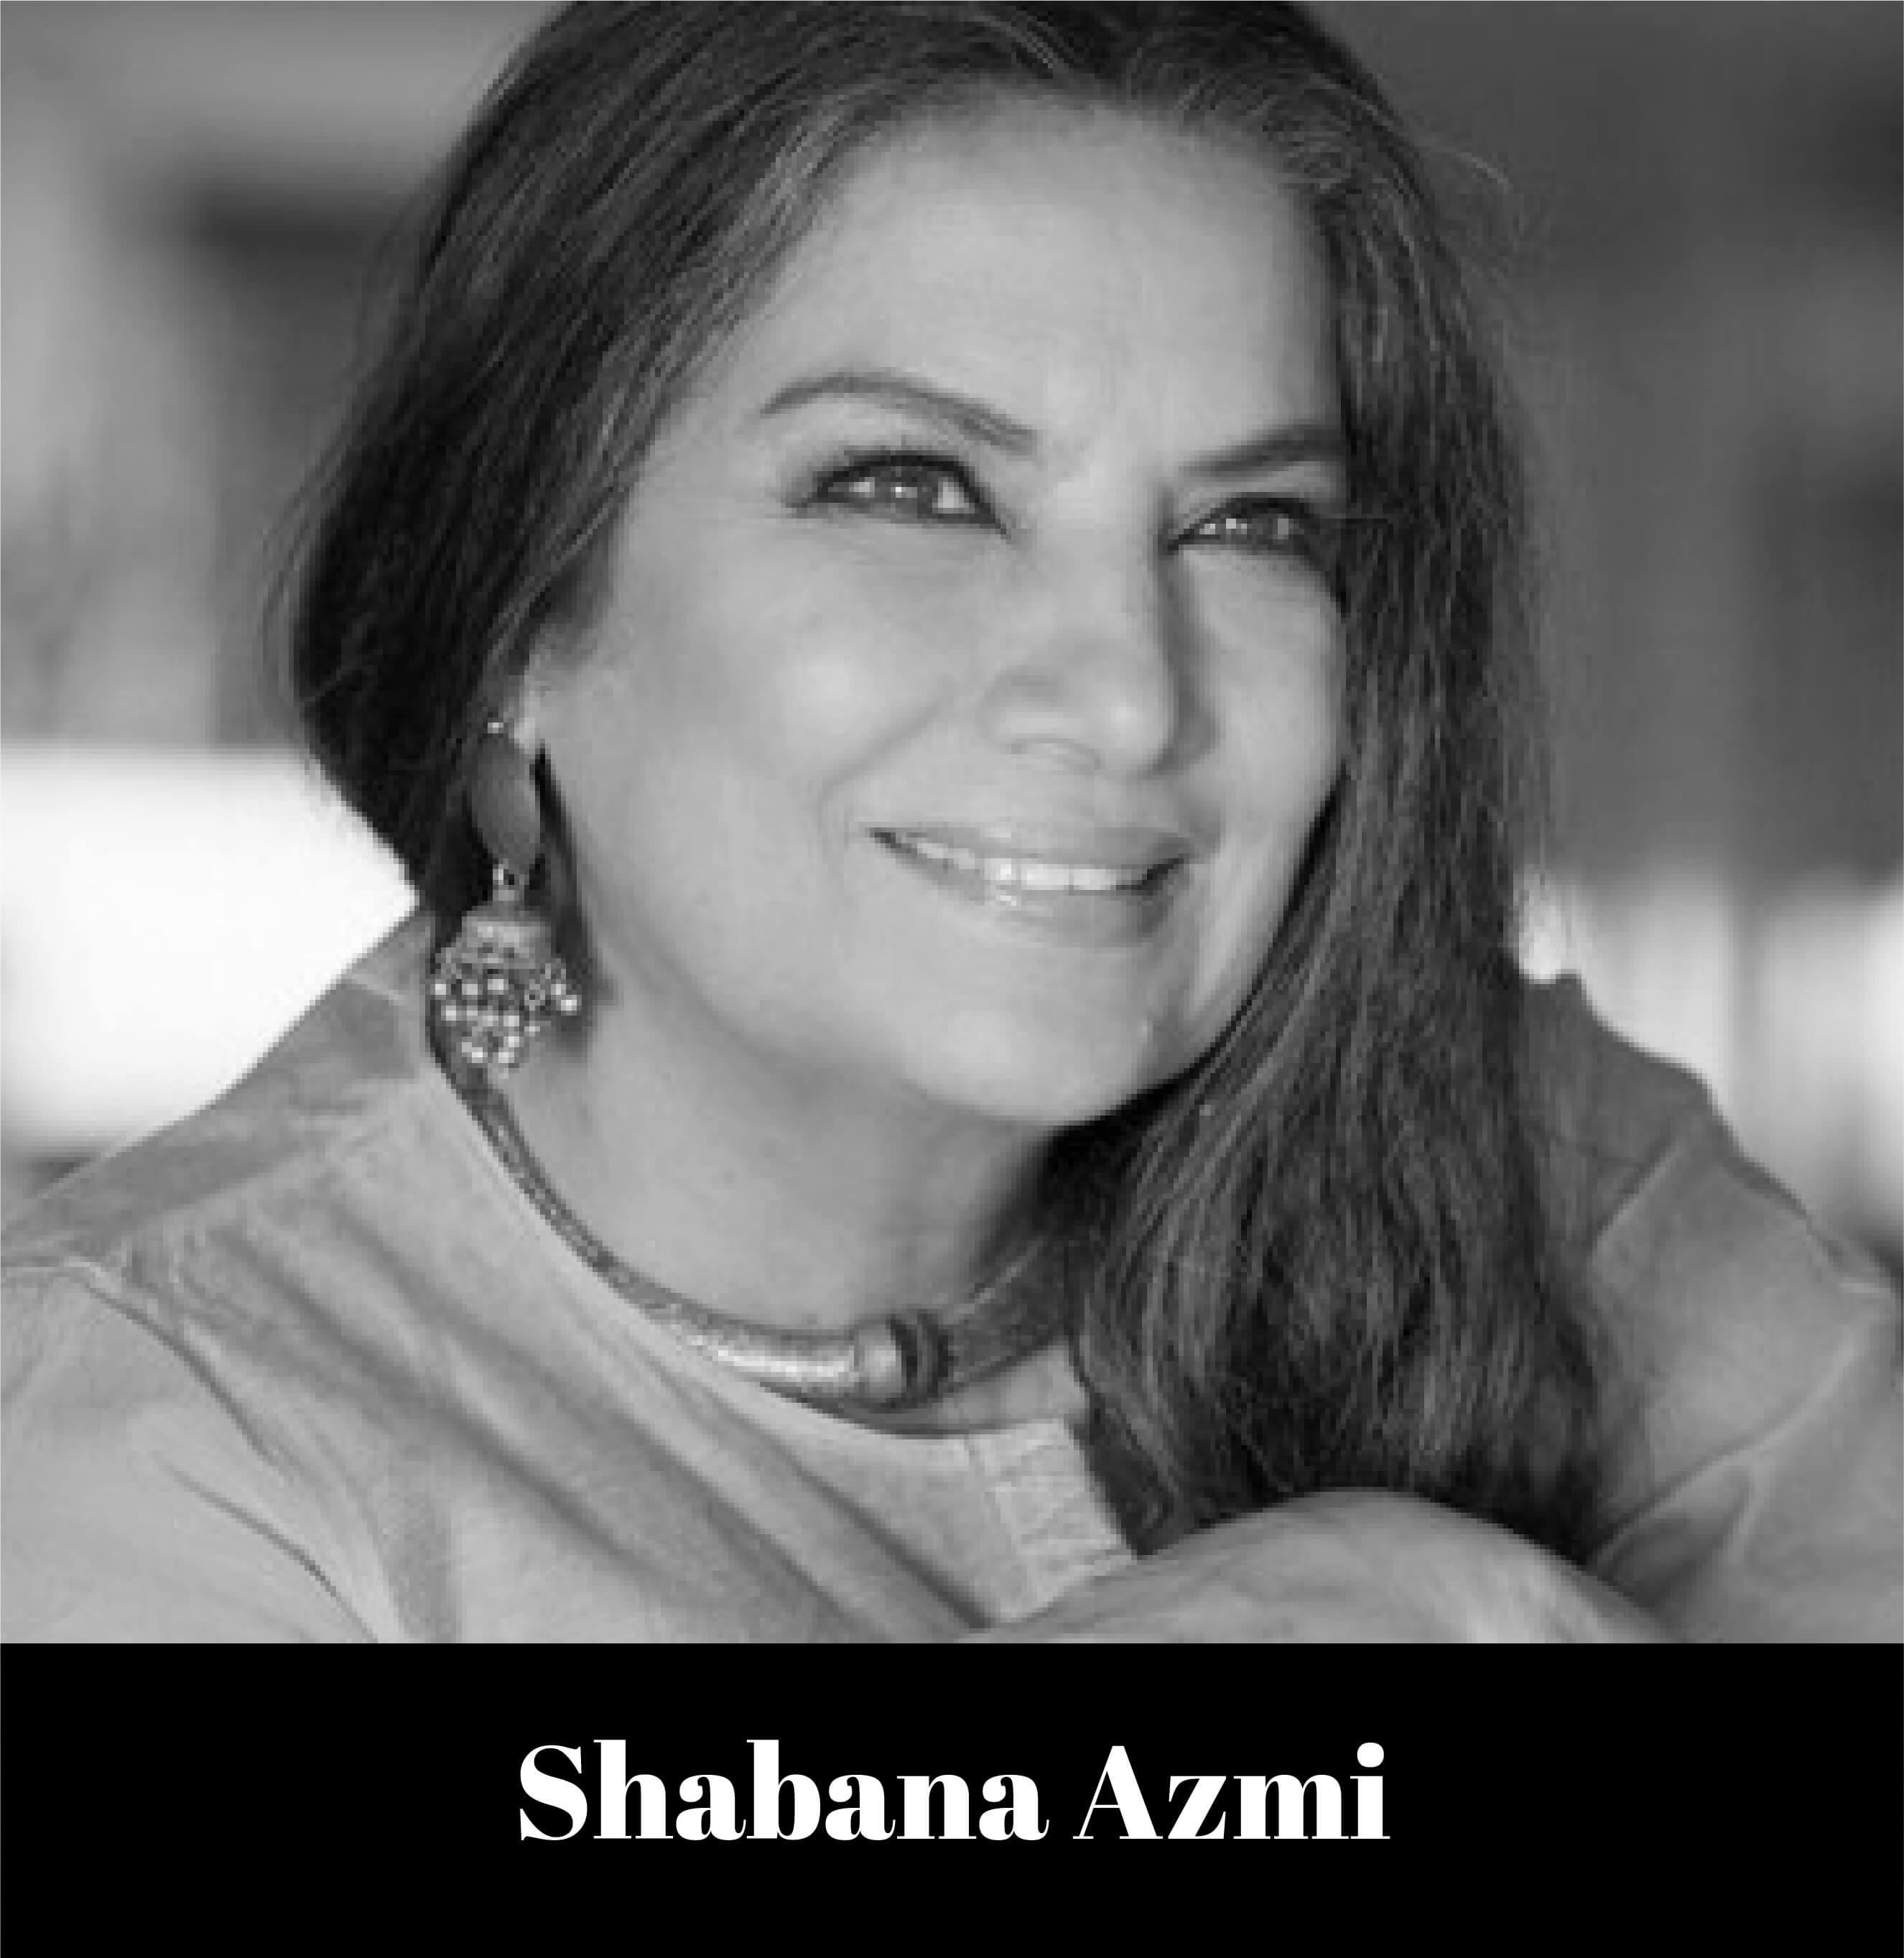 Shabana-Azmi_1.jpg